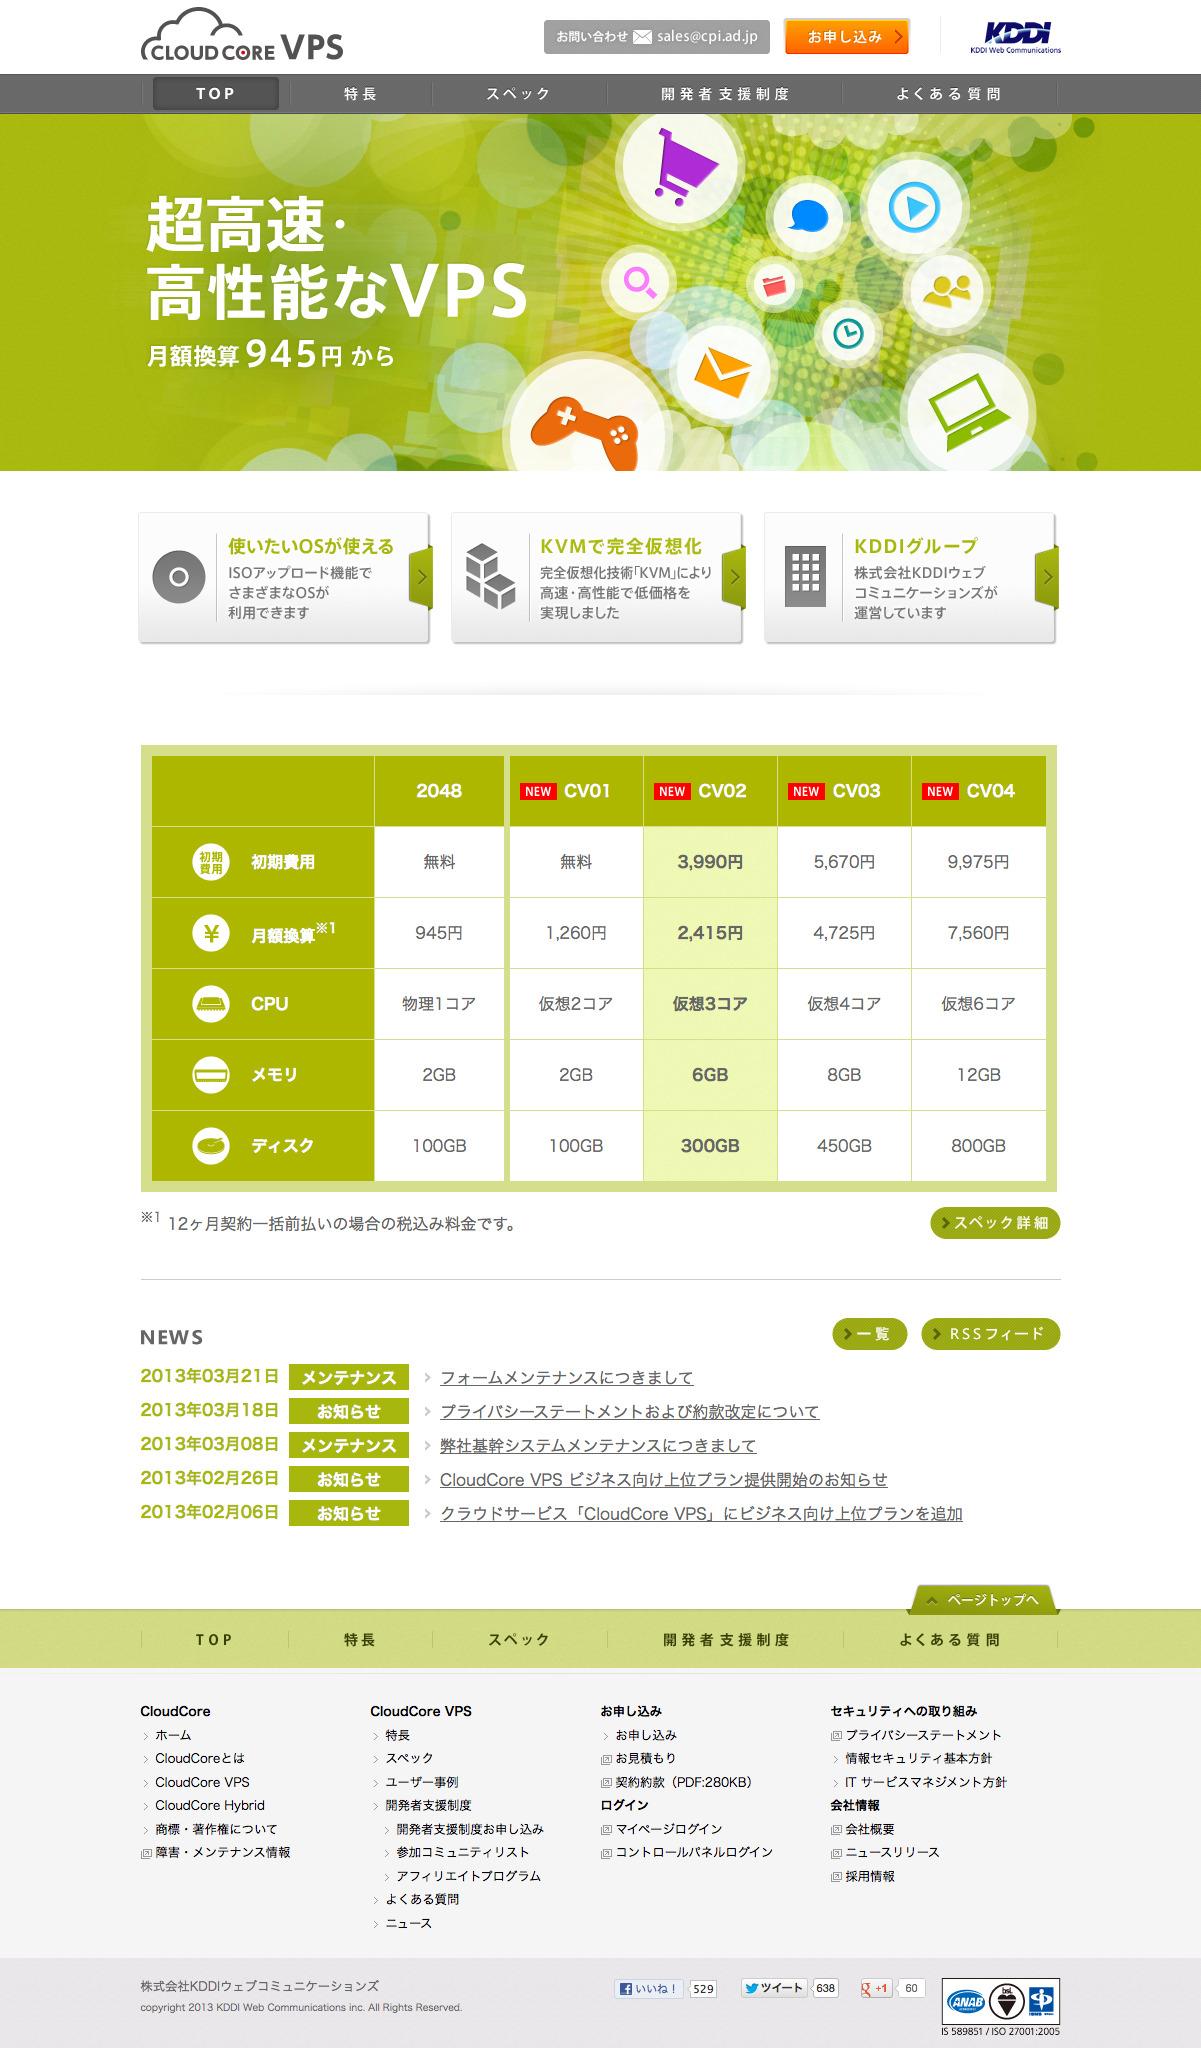 CloudCore VPS|KDDIウェブコミュニケーションズ